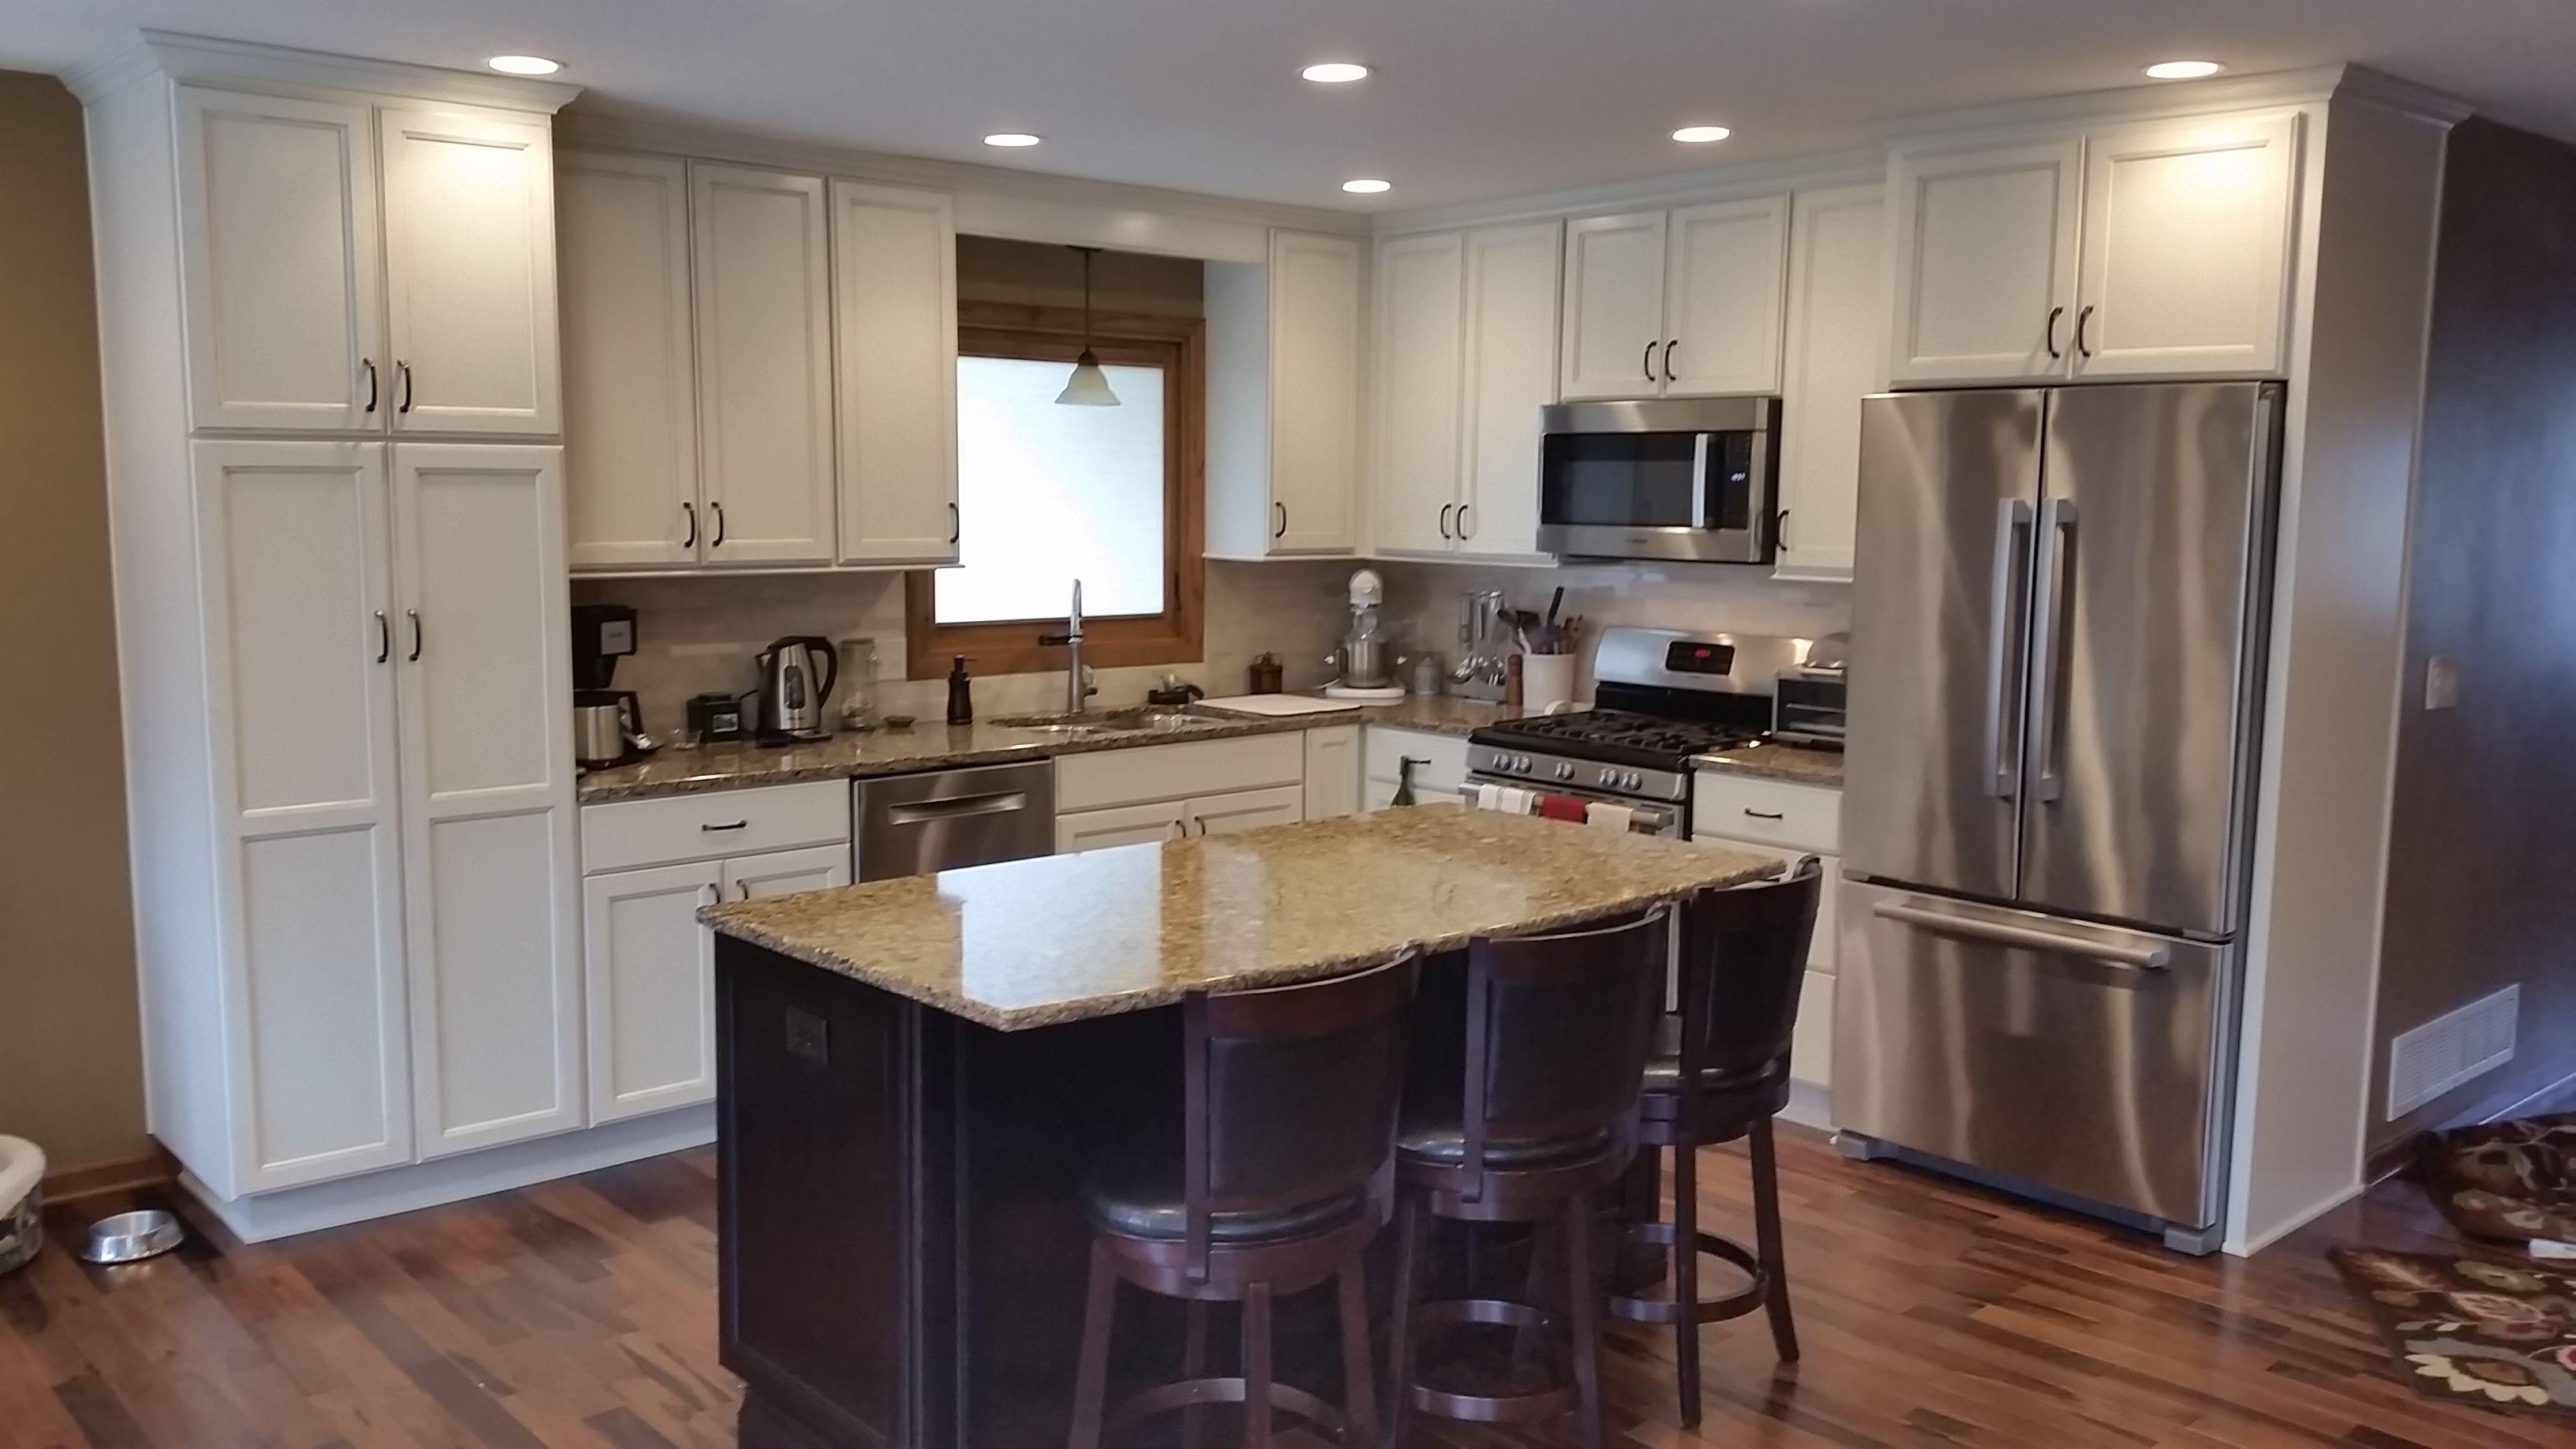 Helander Kitchen Diamond Cabinets – Maple Hanlon door